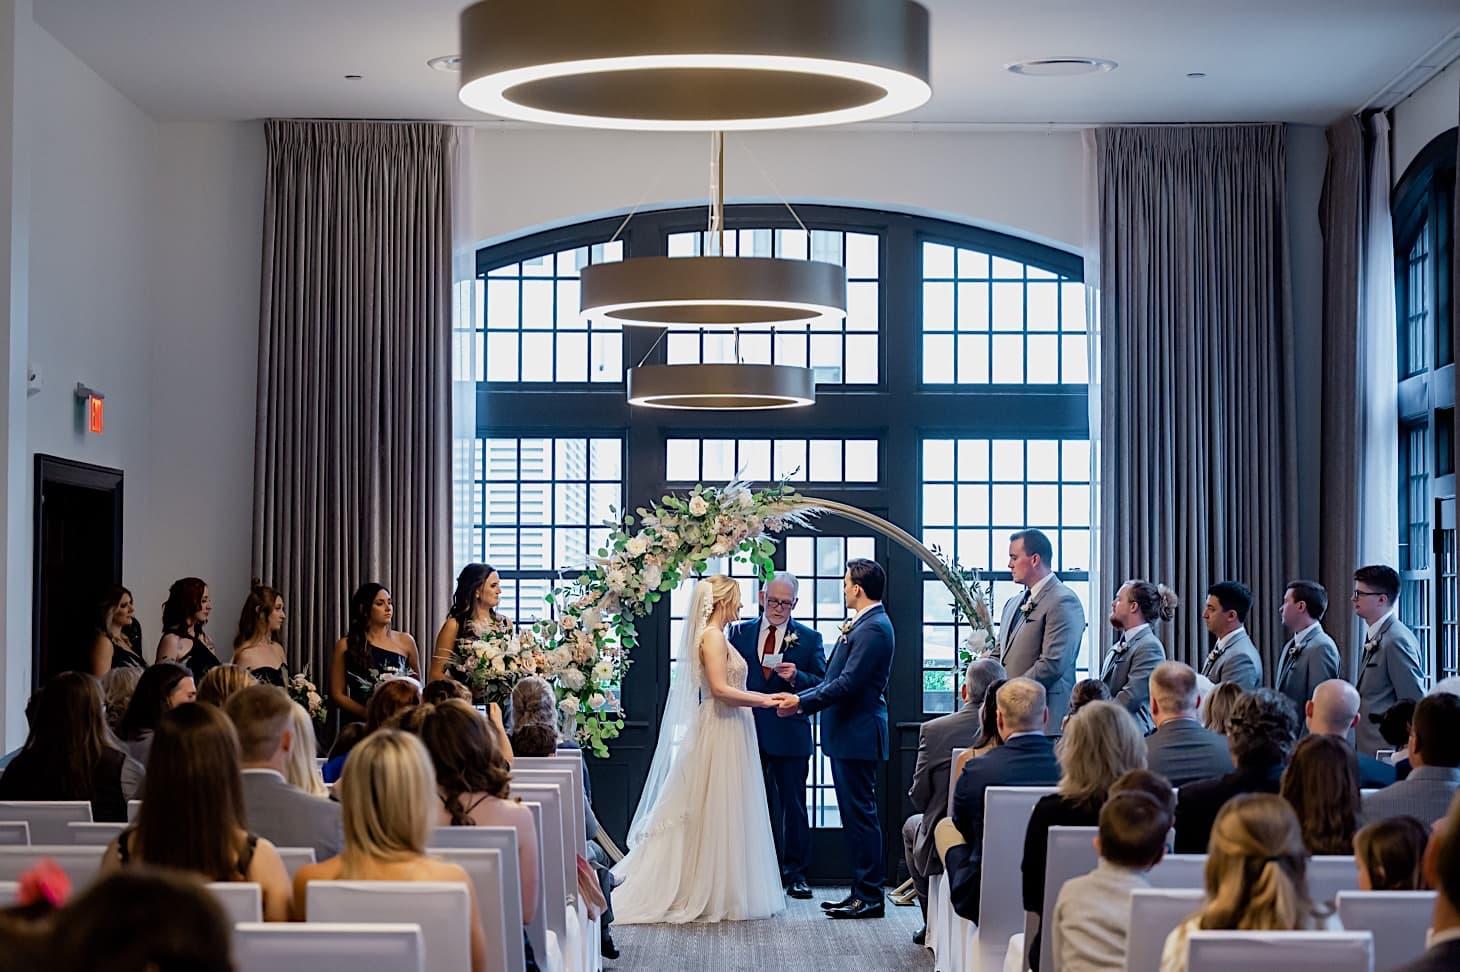 wedding vows at the tea room des moines